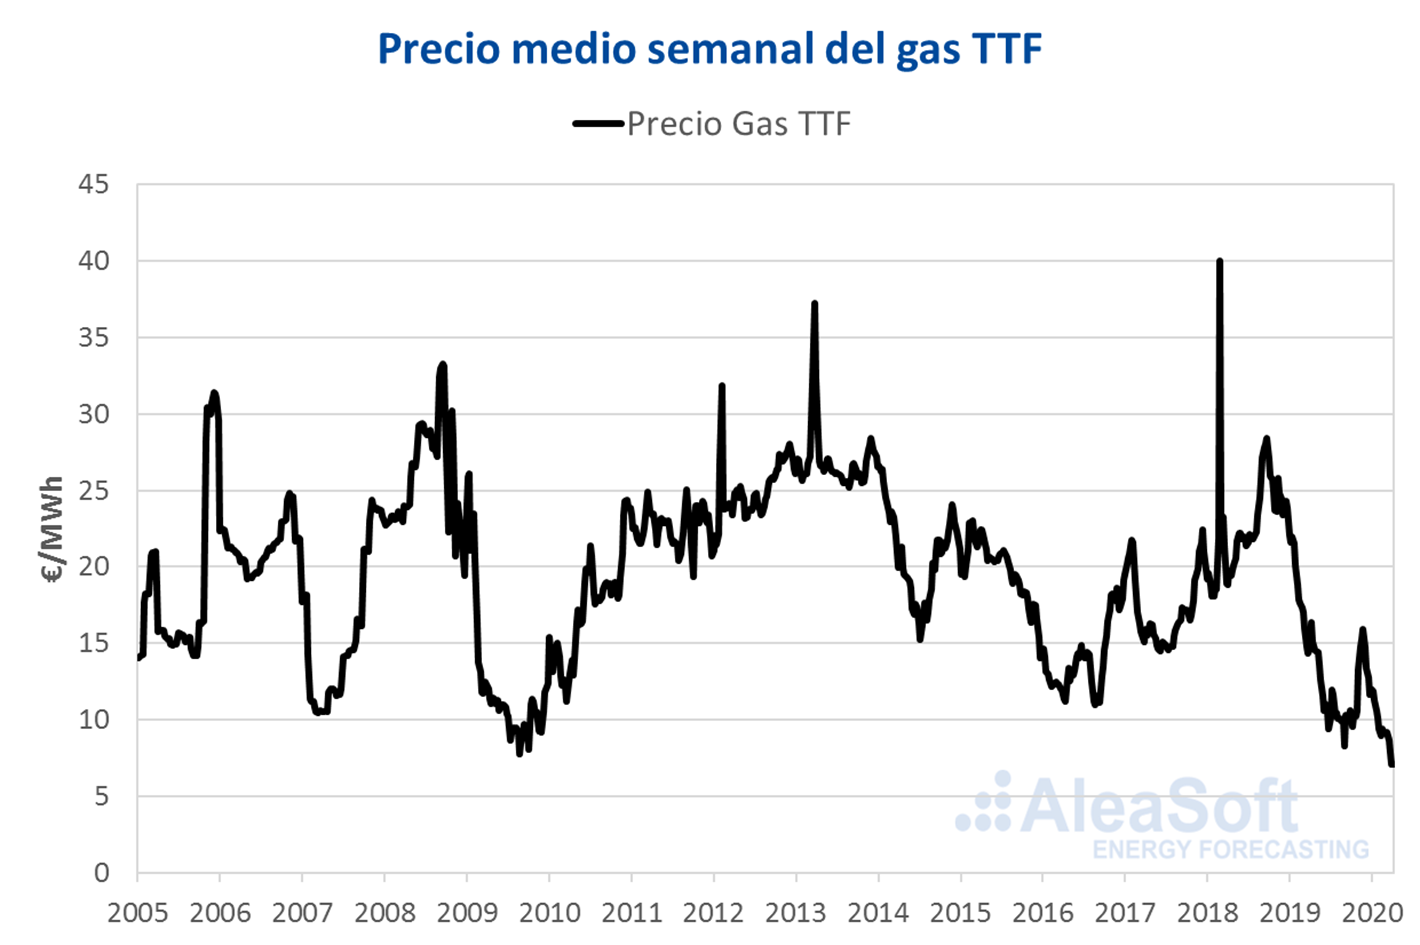 AleaSoft - Precio gas europeo TTF